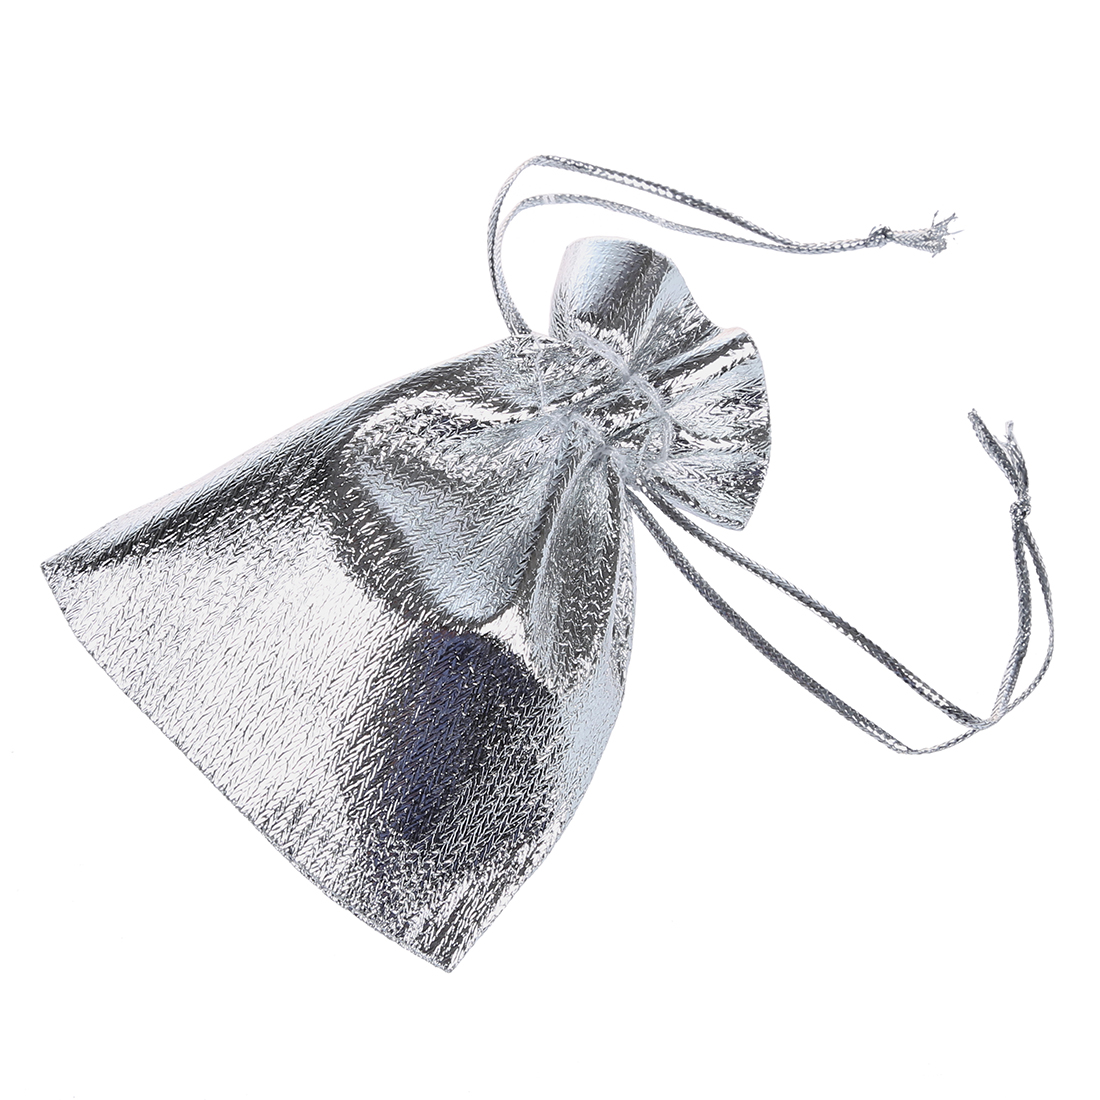 100 Pcs Organza Bag Jewelry Gift Bag 2.75 X 3.54 Inch